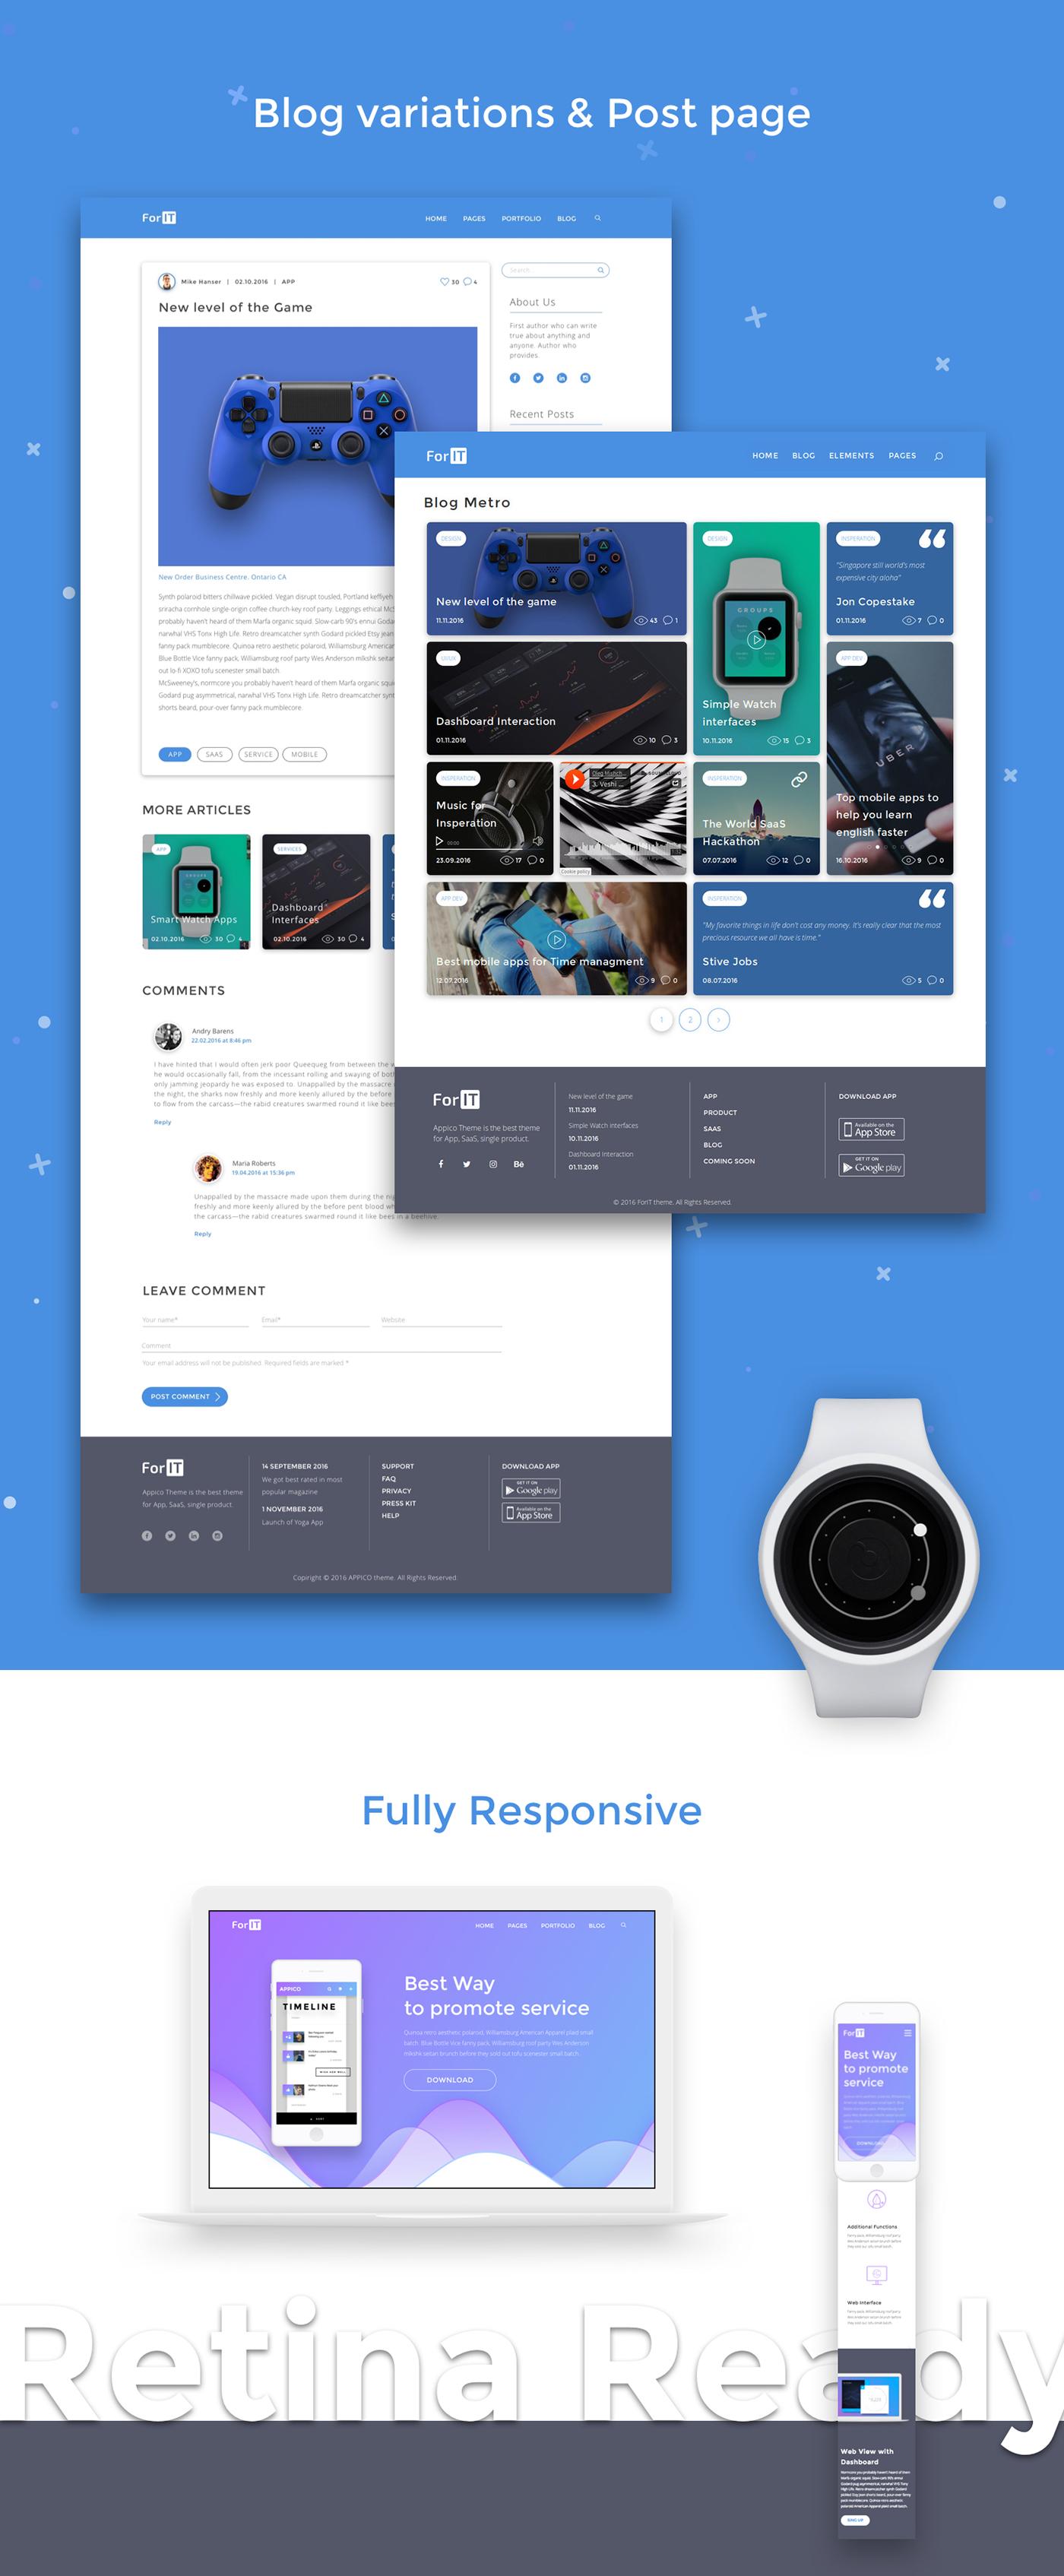 wordpress,Web,themeforest,envato,SAAS,app,product case,Startup,software